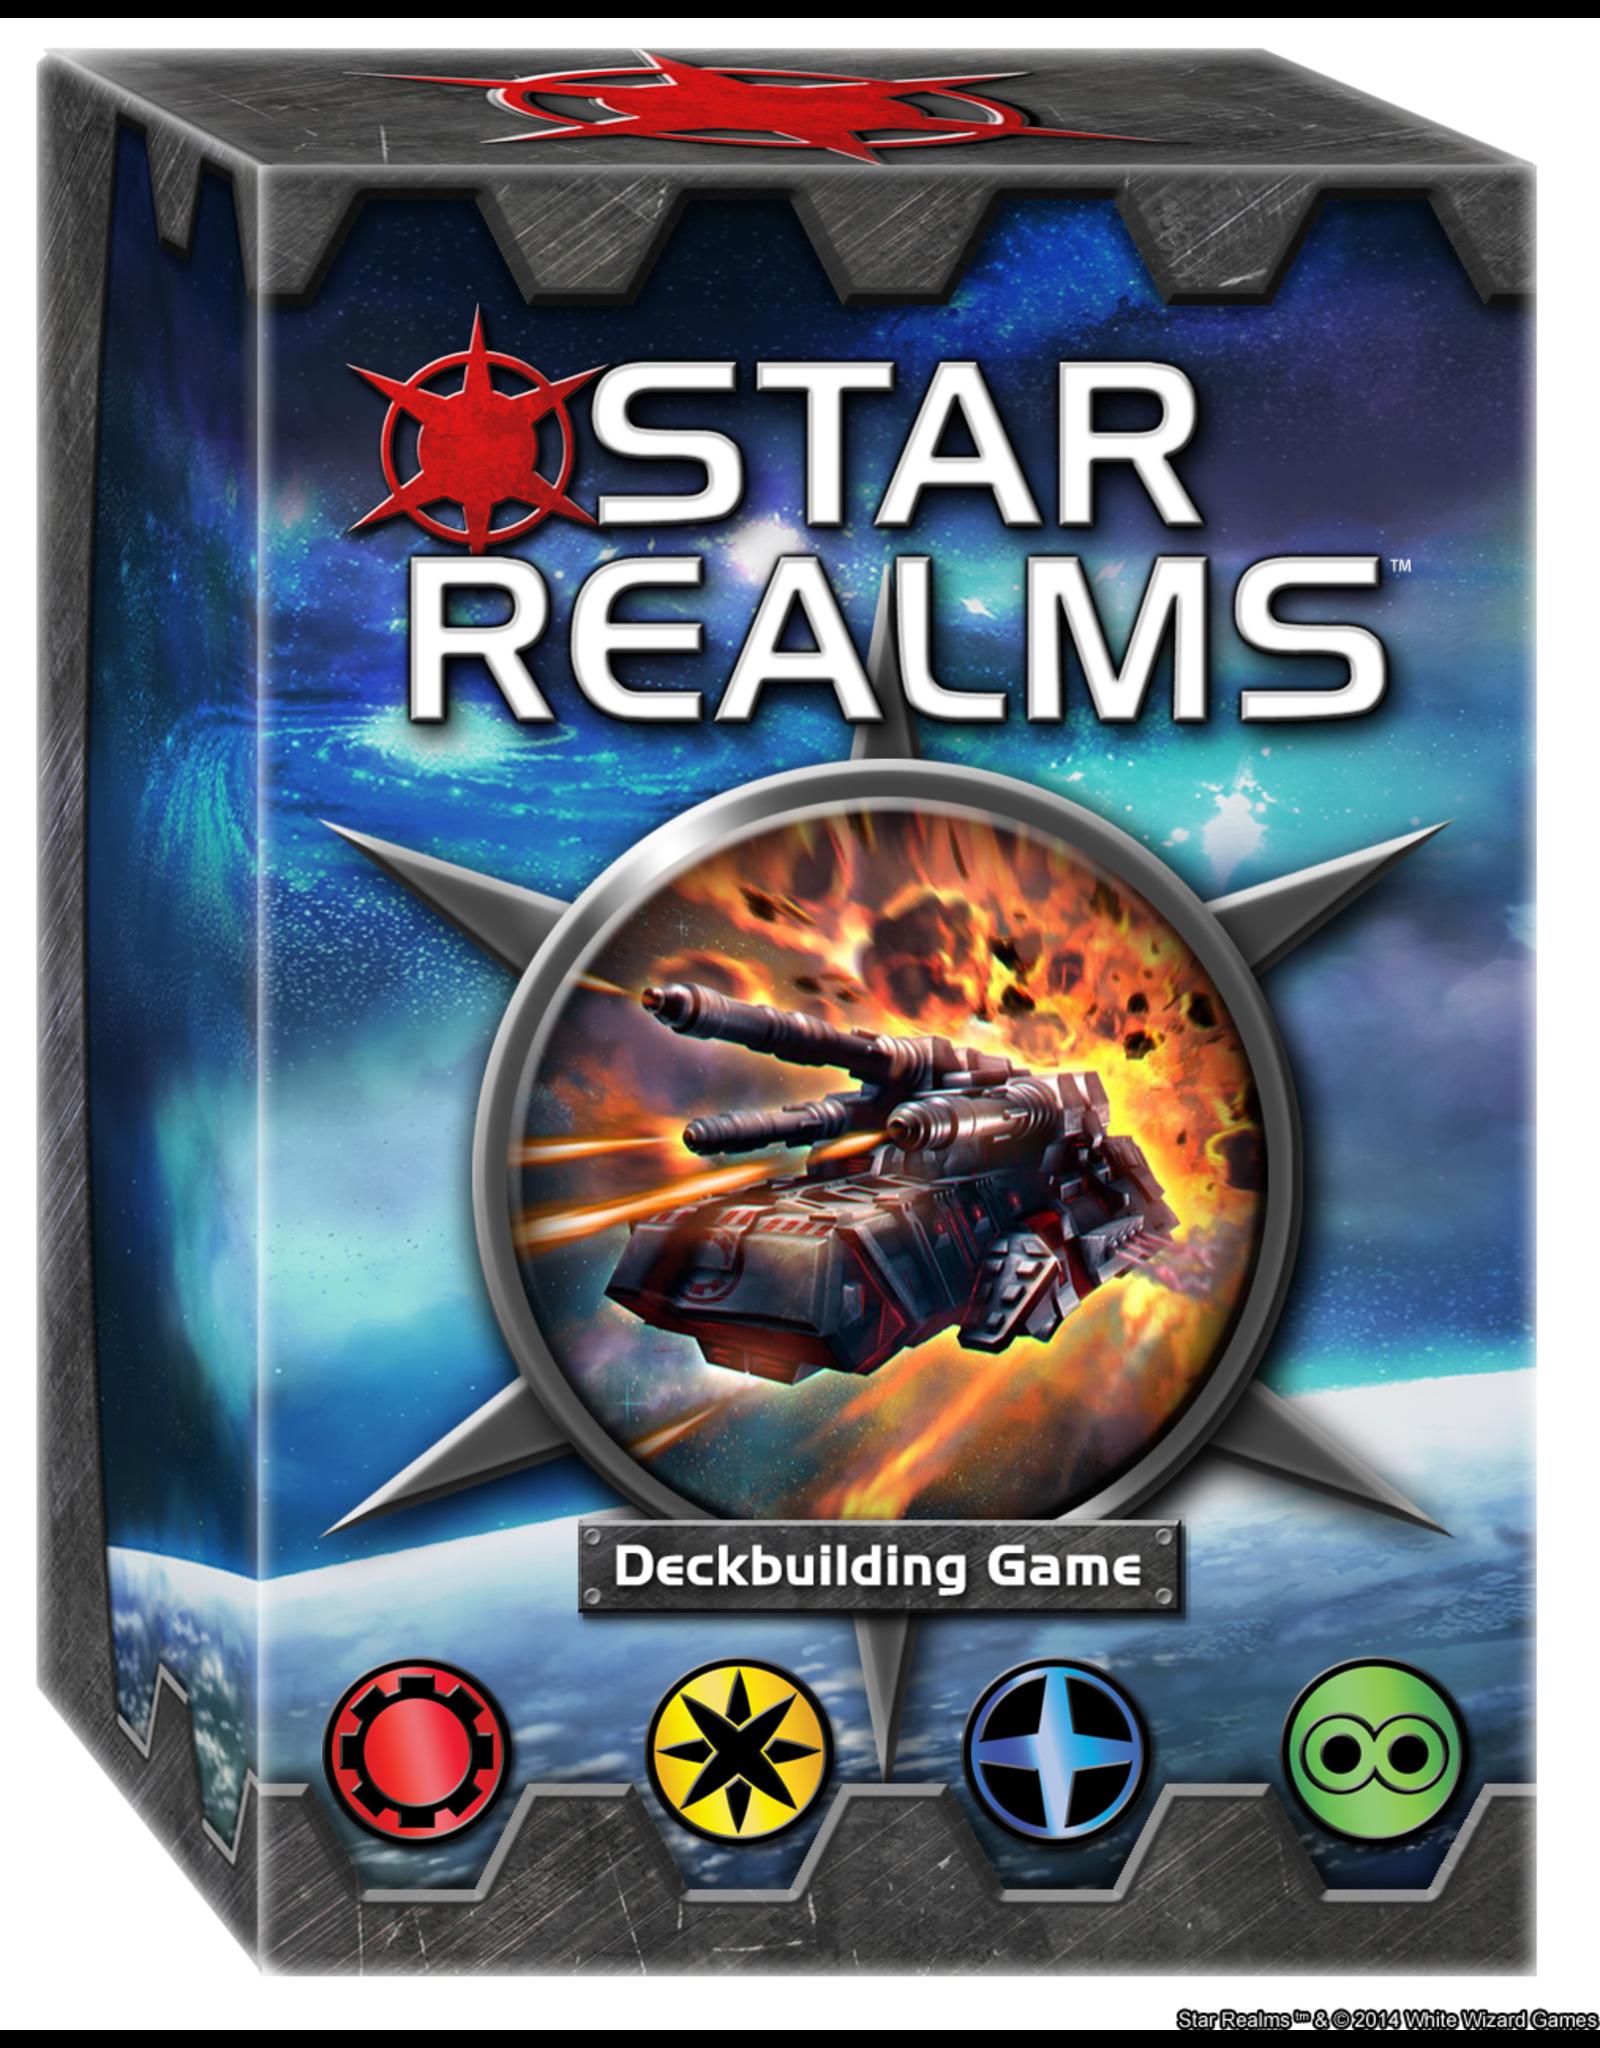 Star Realms Base Set